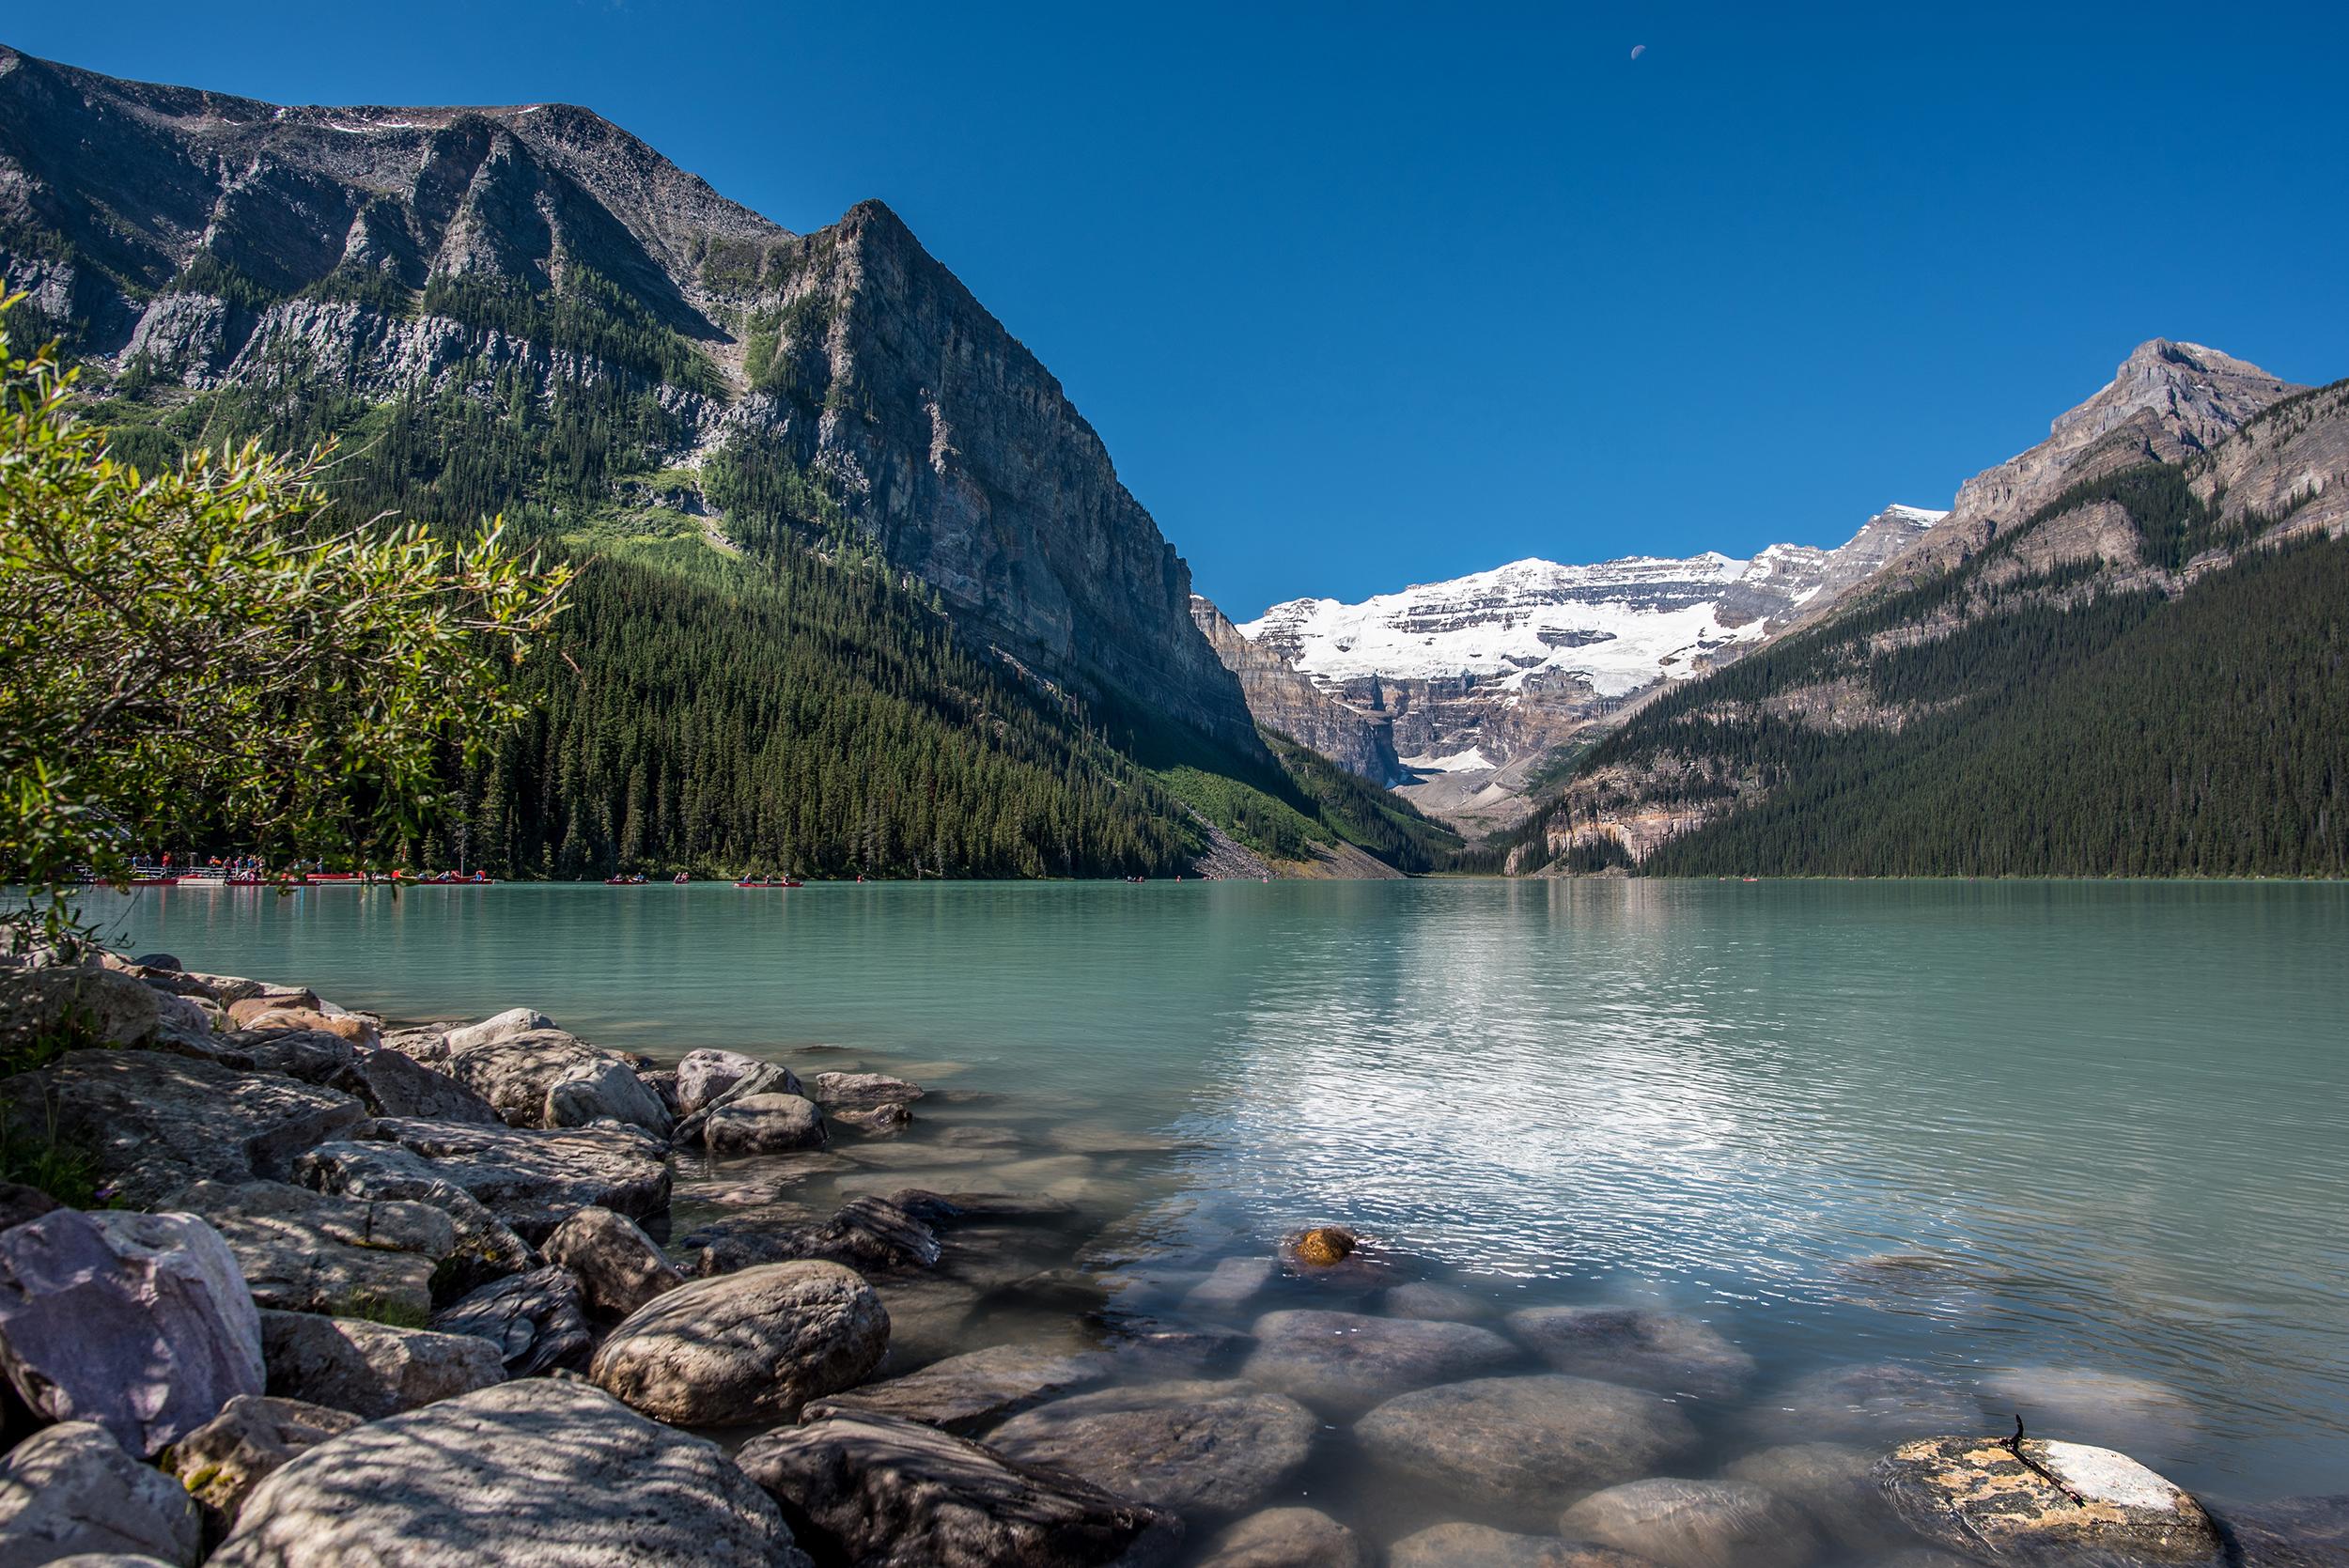 Tim-Burke-Canada-Trip-7050.jpg